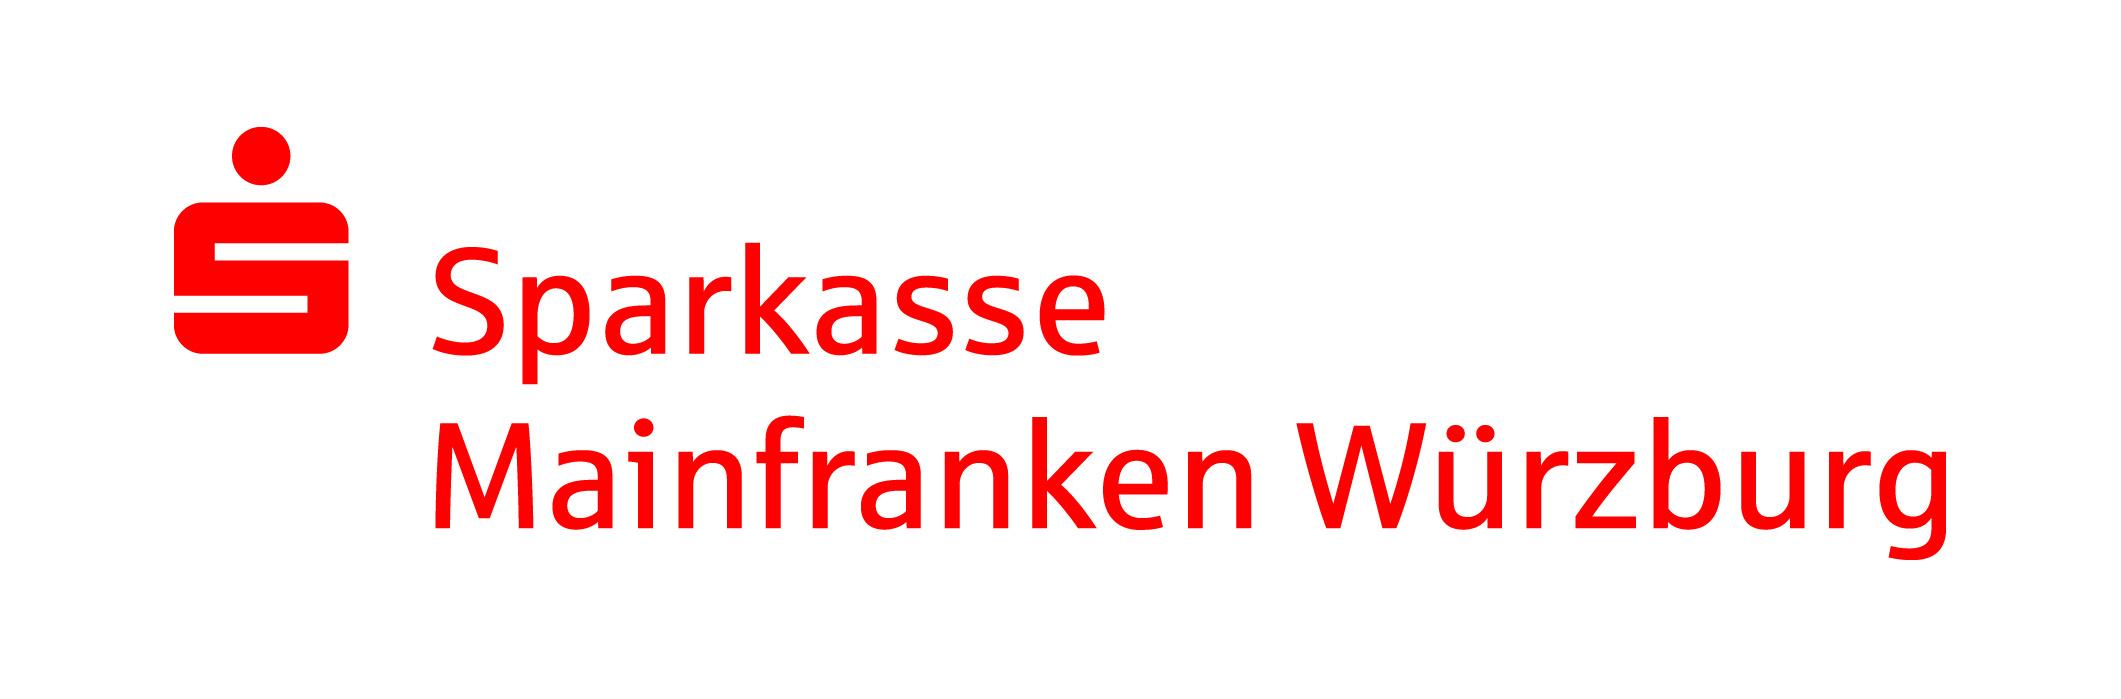 Sparkasse Mainfranken